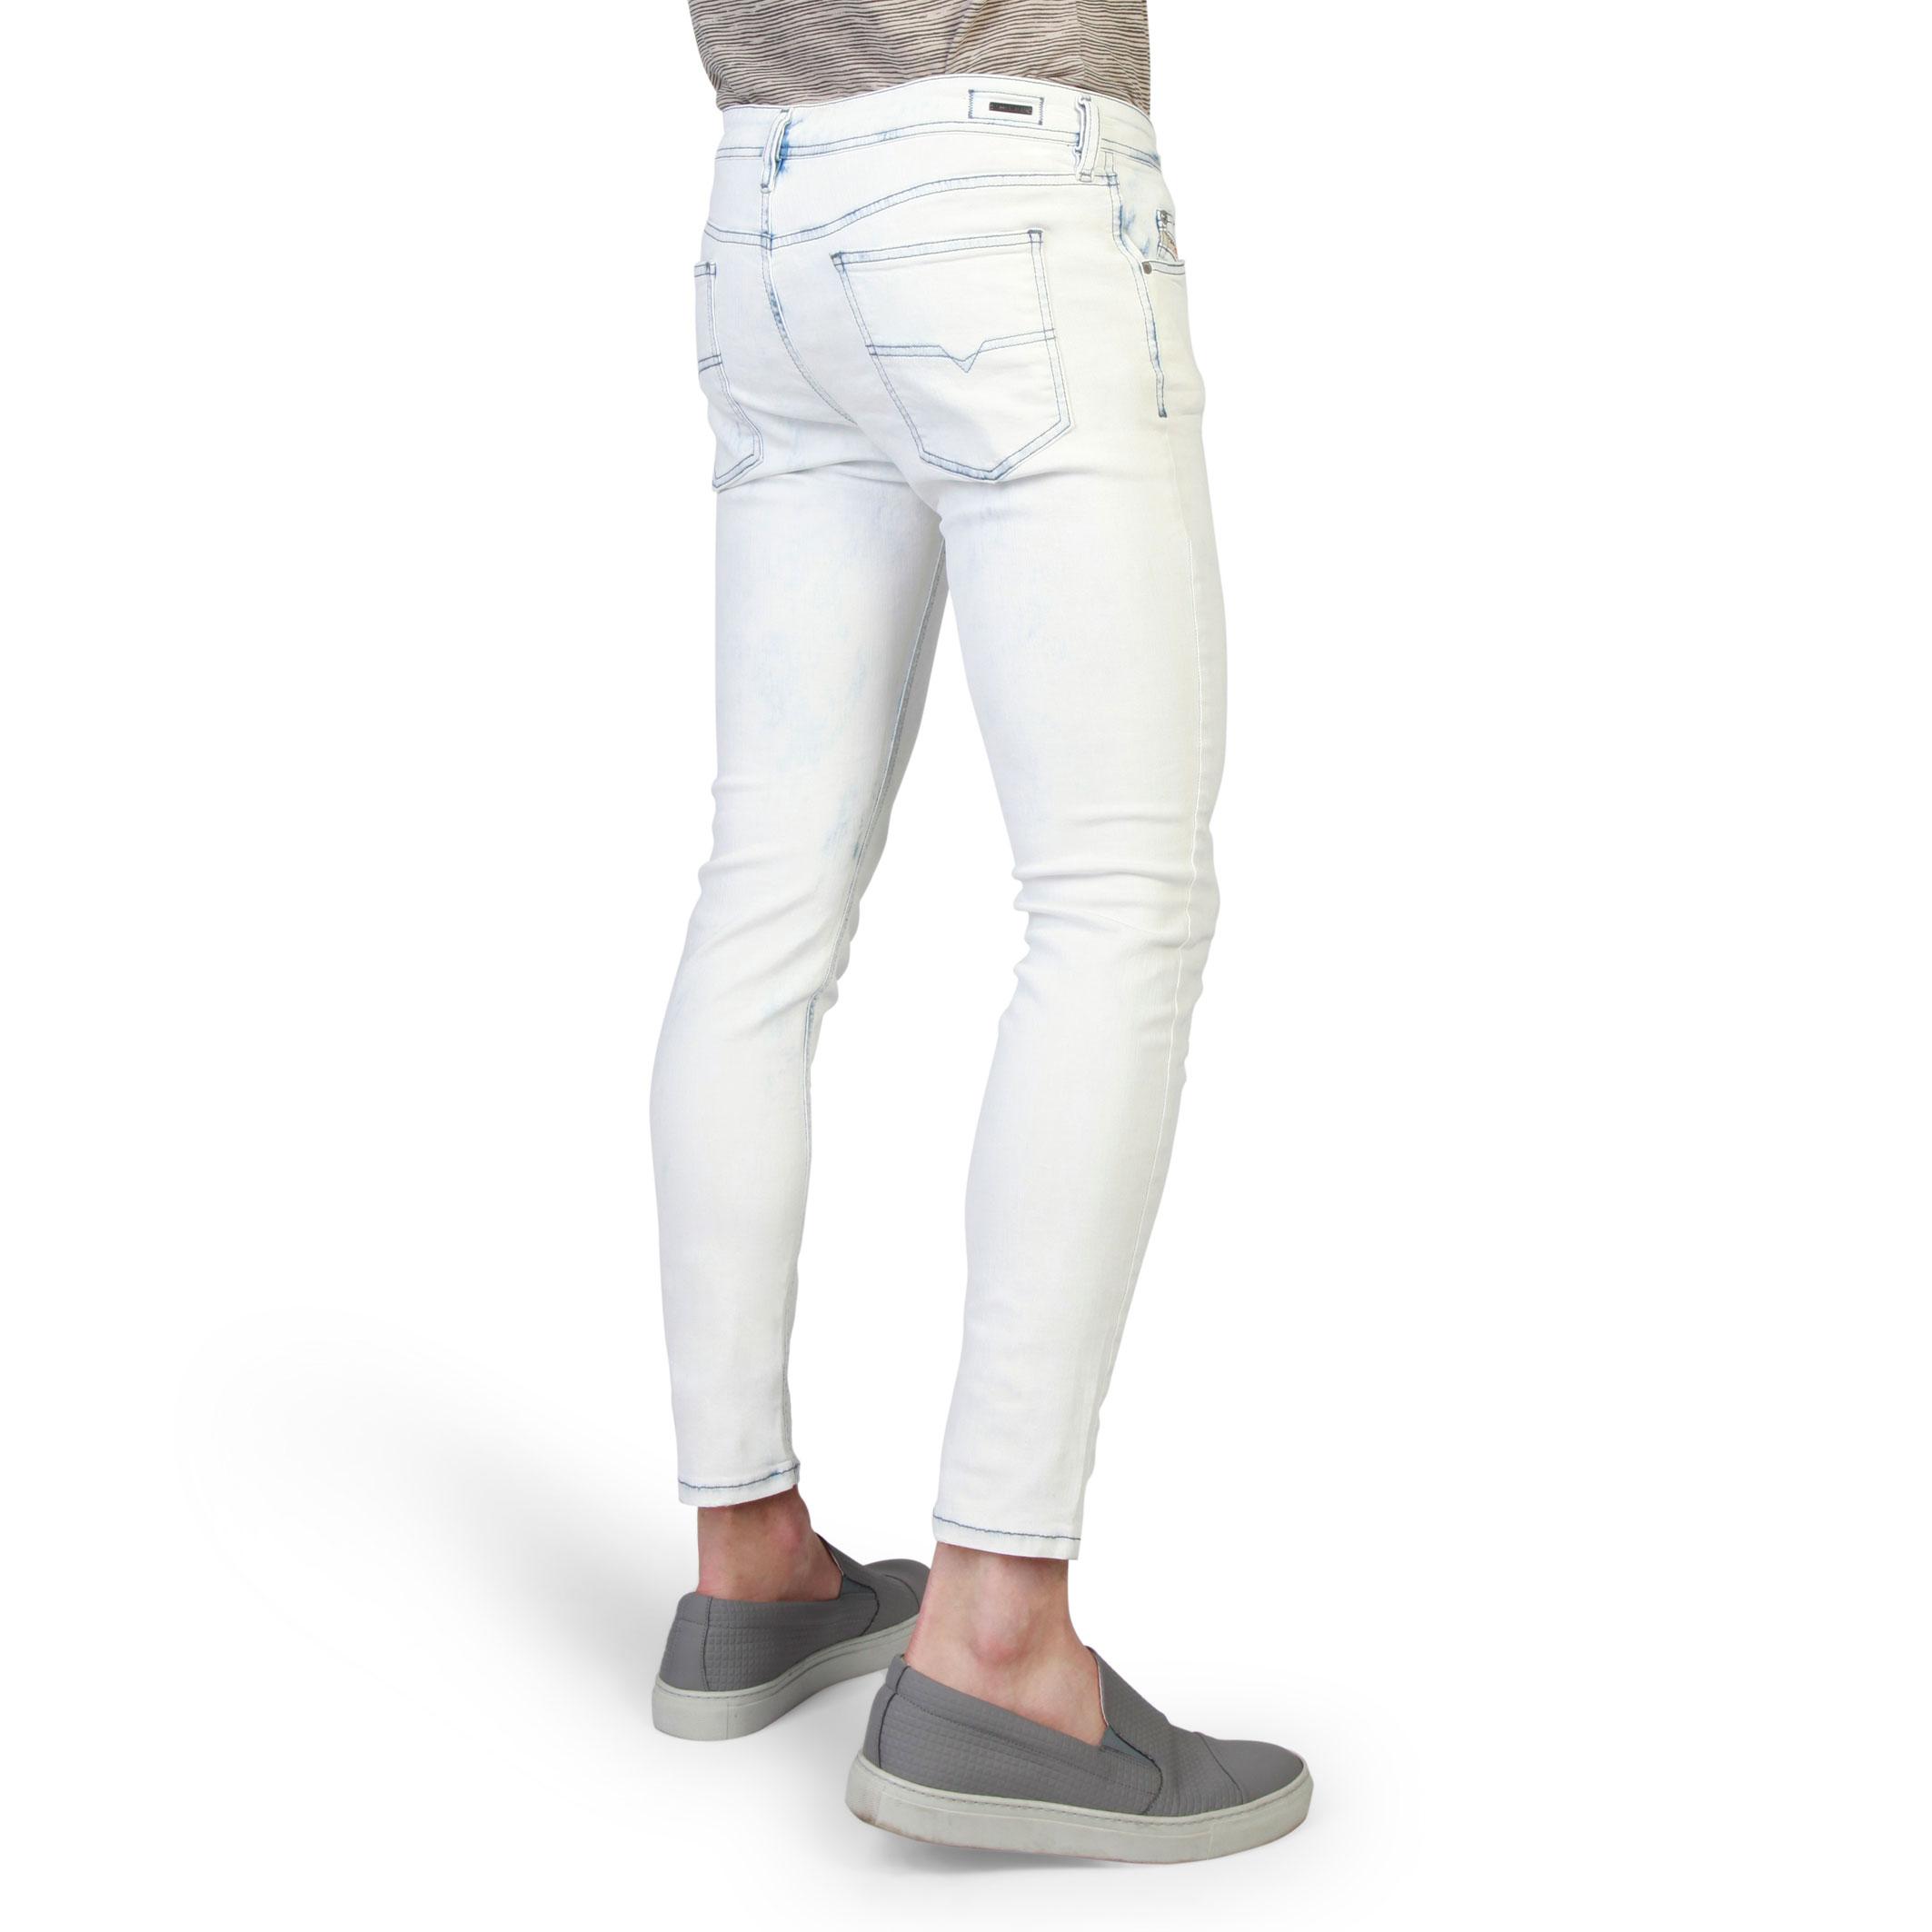 Jeans-Diesel-STICKKER-00SIV6-0851J-Uomo-Blu-90918 miniatura 2